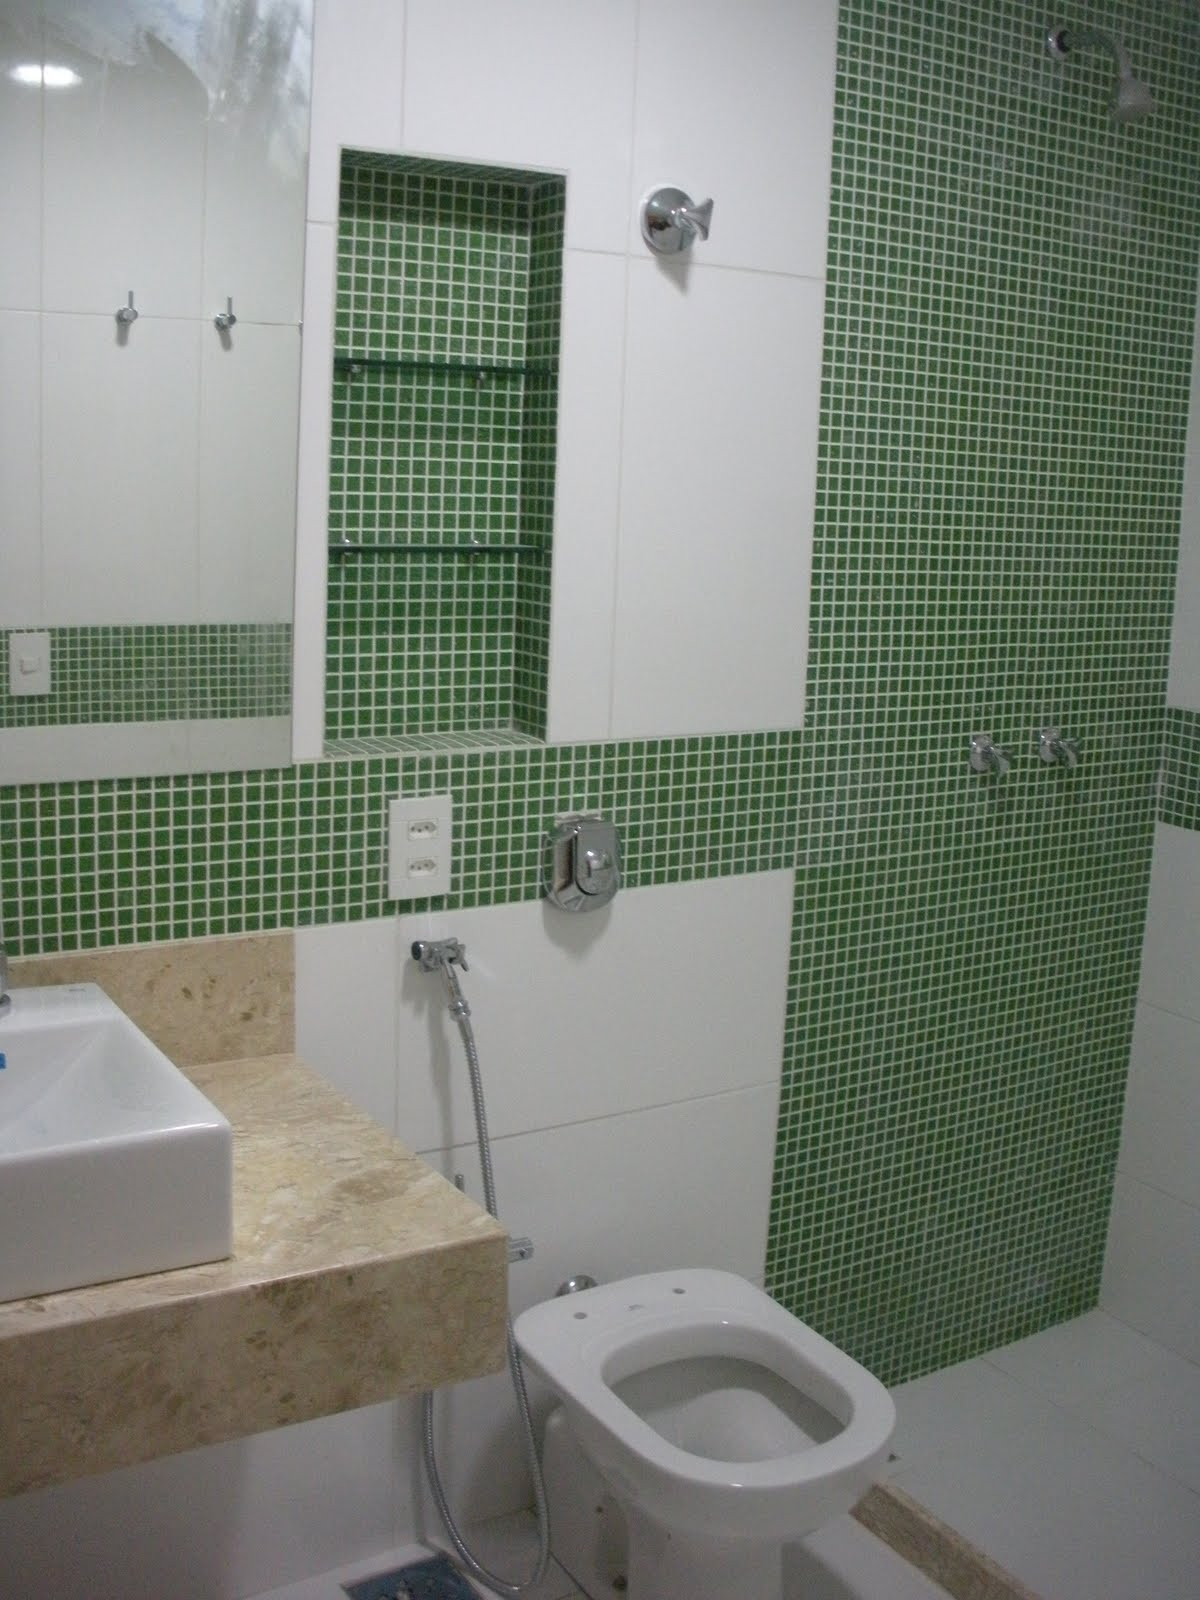 Banheiro Bege Com Pastilha Verde  rinkratmagcom banheiros decorados 2017 -> Decoracao De Banheiro Com Pastilhas Bege